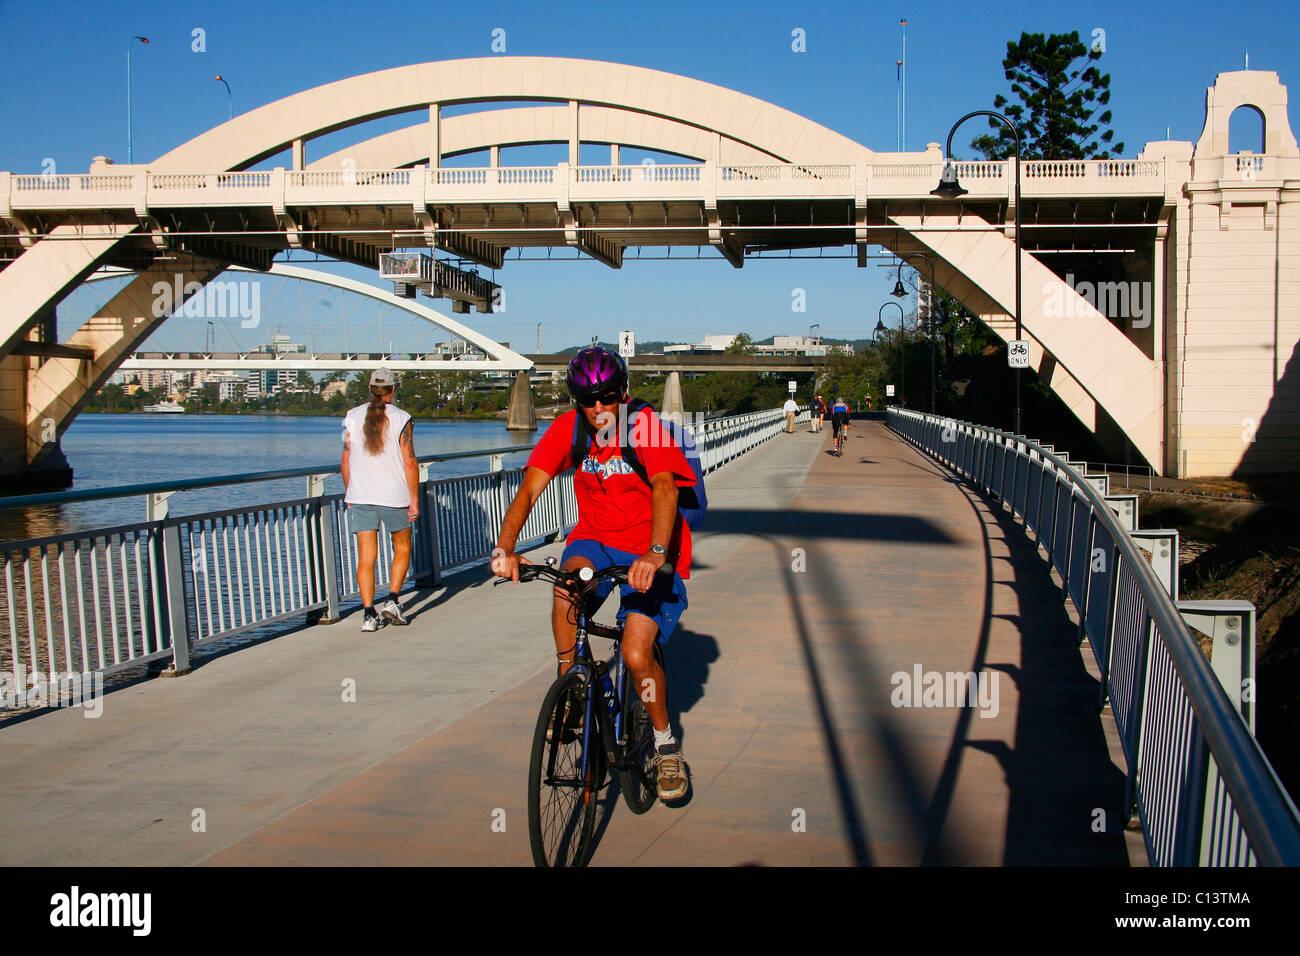 Cycleway Brisbane Australia - Stock Image